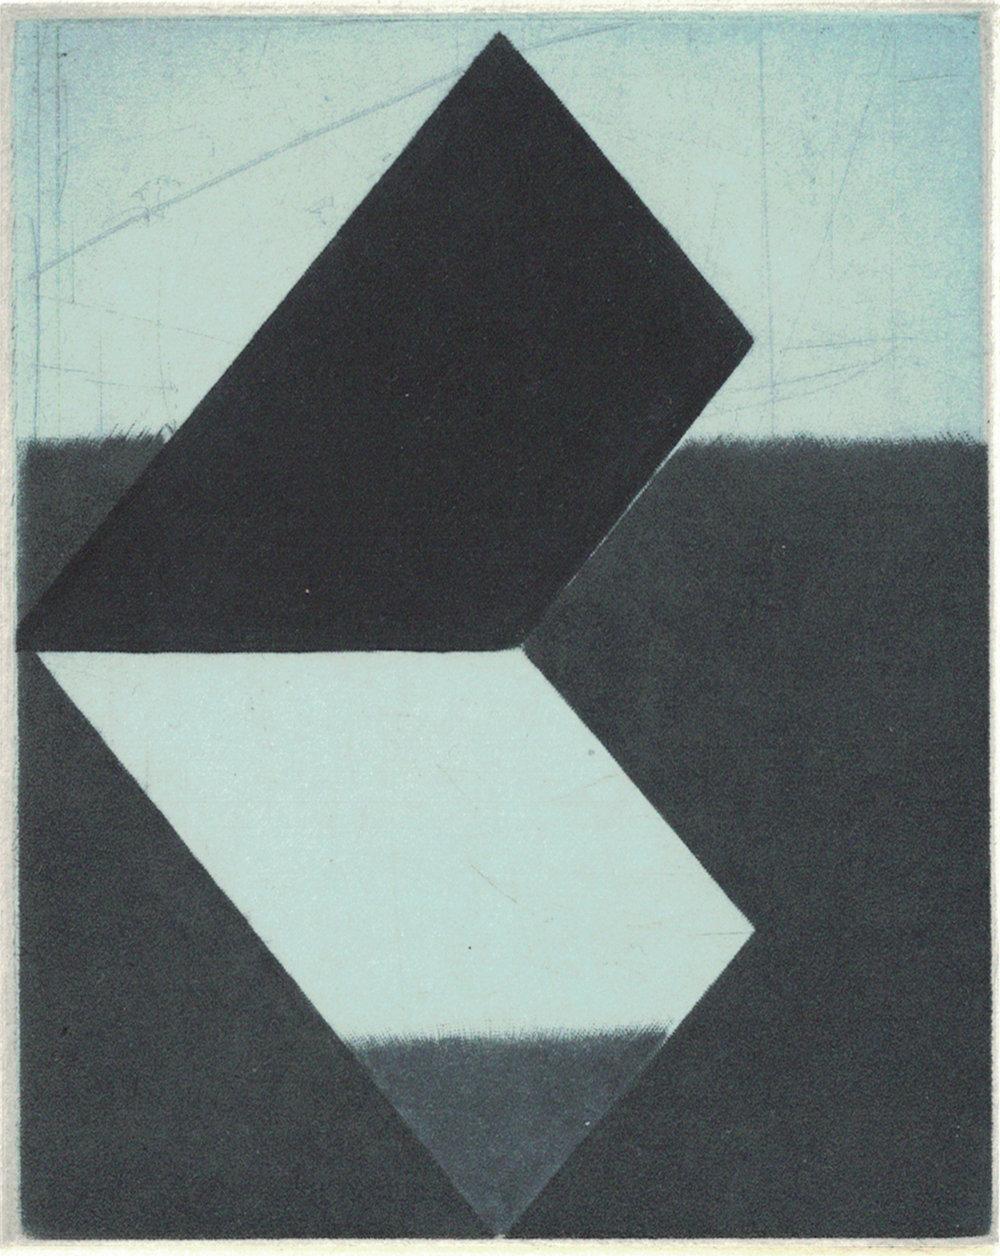 Image: Majla Zeneli, OSAC 6, 2018, Mezzotint Print, 10 x 8 cm